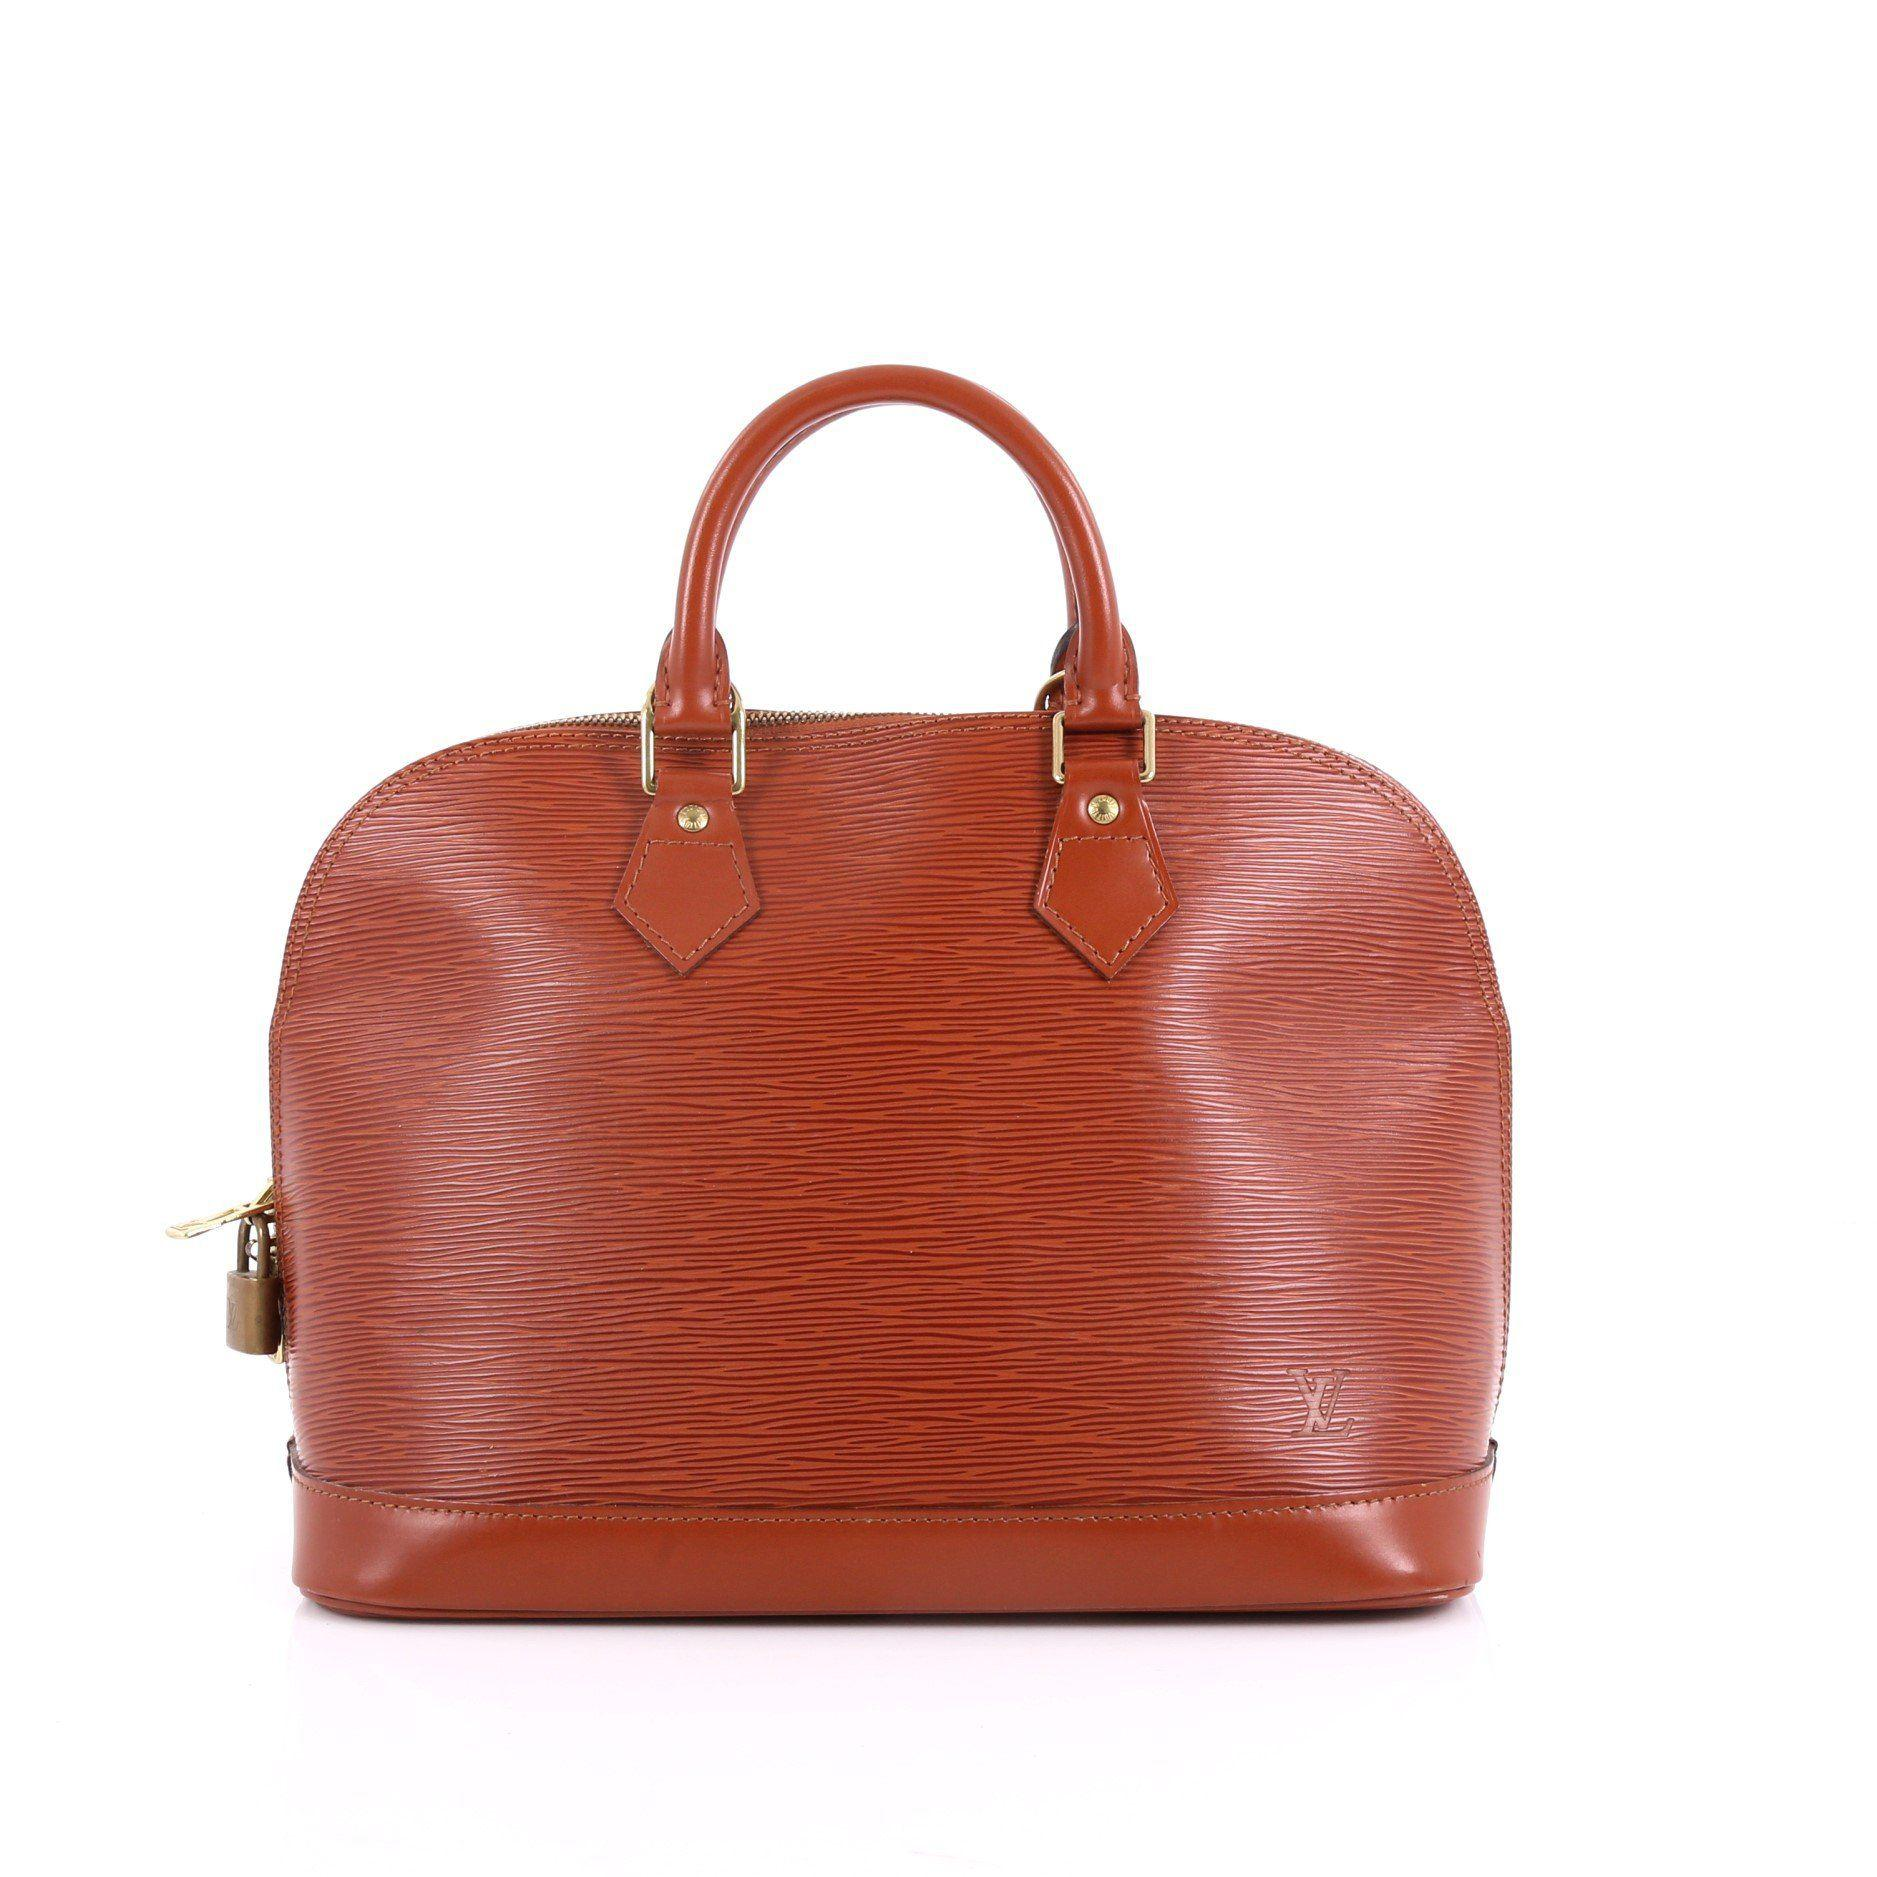 337063dad14a Louis Vuitton. Women s Red Pre Owned Vintage Alma Handbag Epi Leather Pm